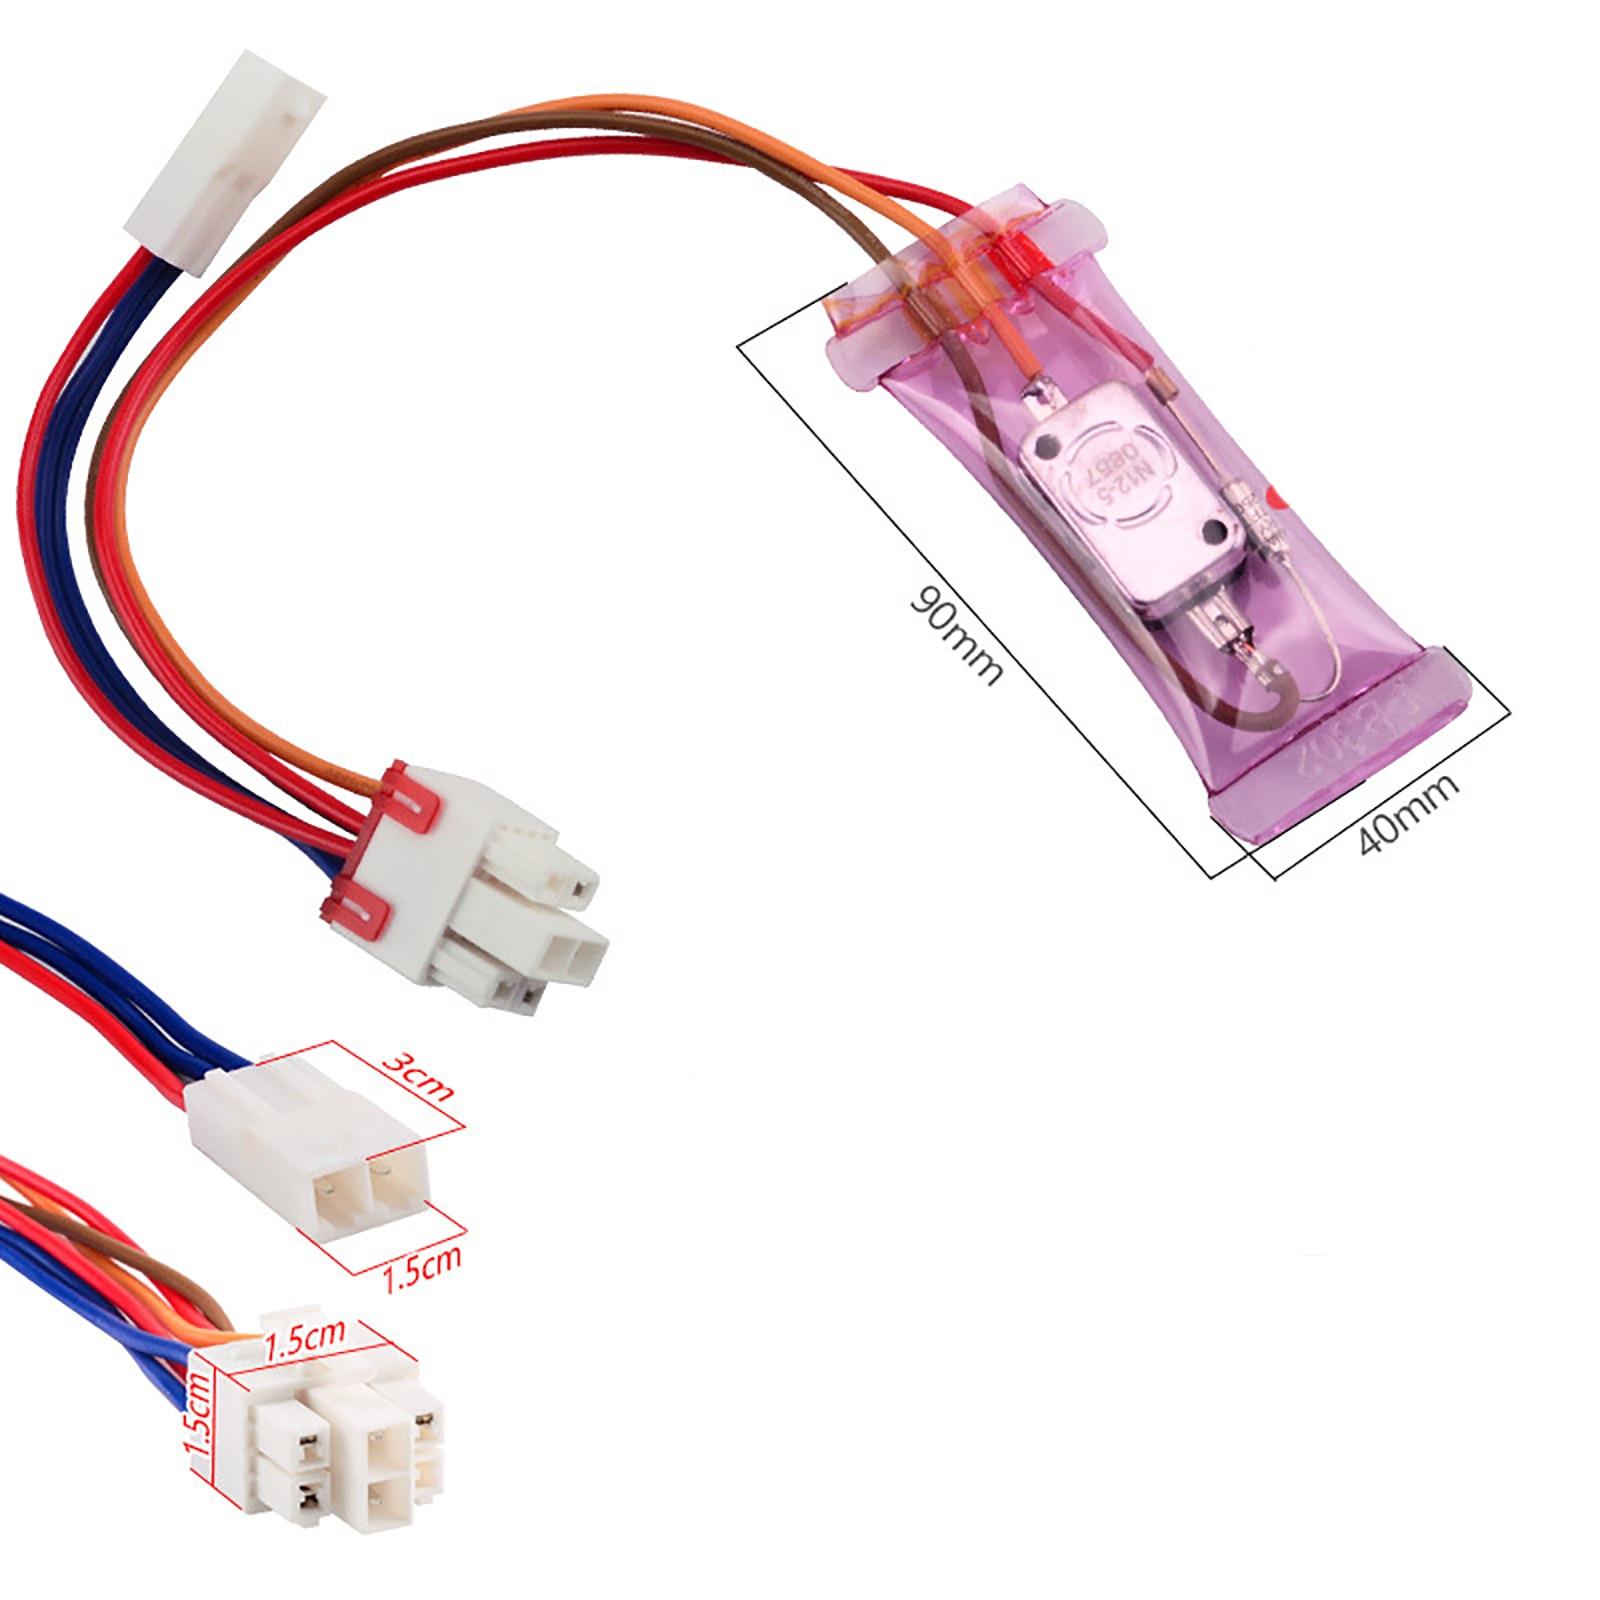 AC 250V 10A N12-5 Degrees Celsius 3 Cables(square) Bimetal Fridges Defroster Thermostat Refrigerator Defrost Thermostat